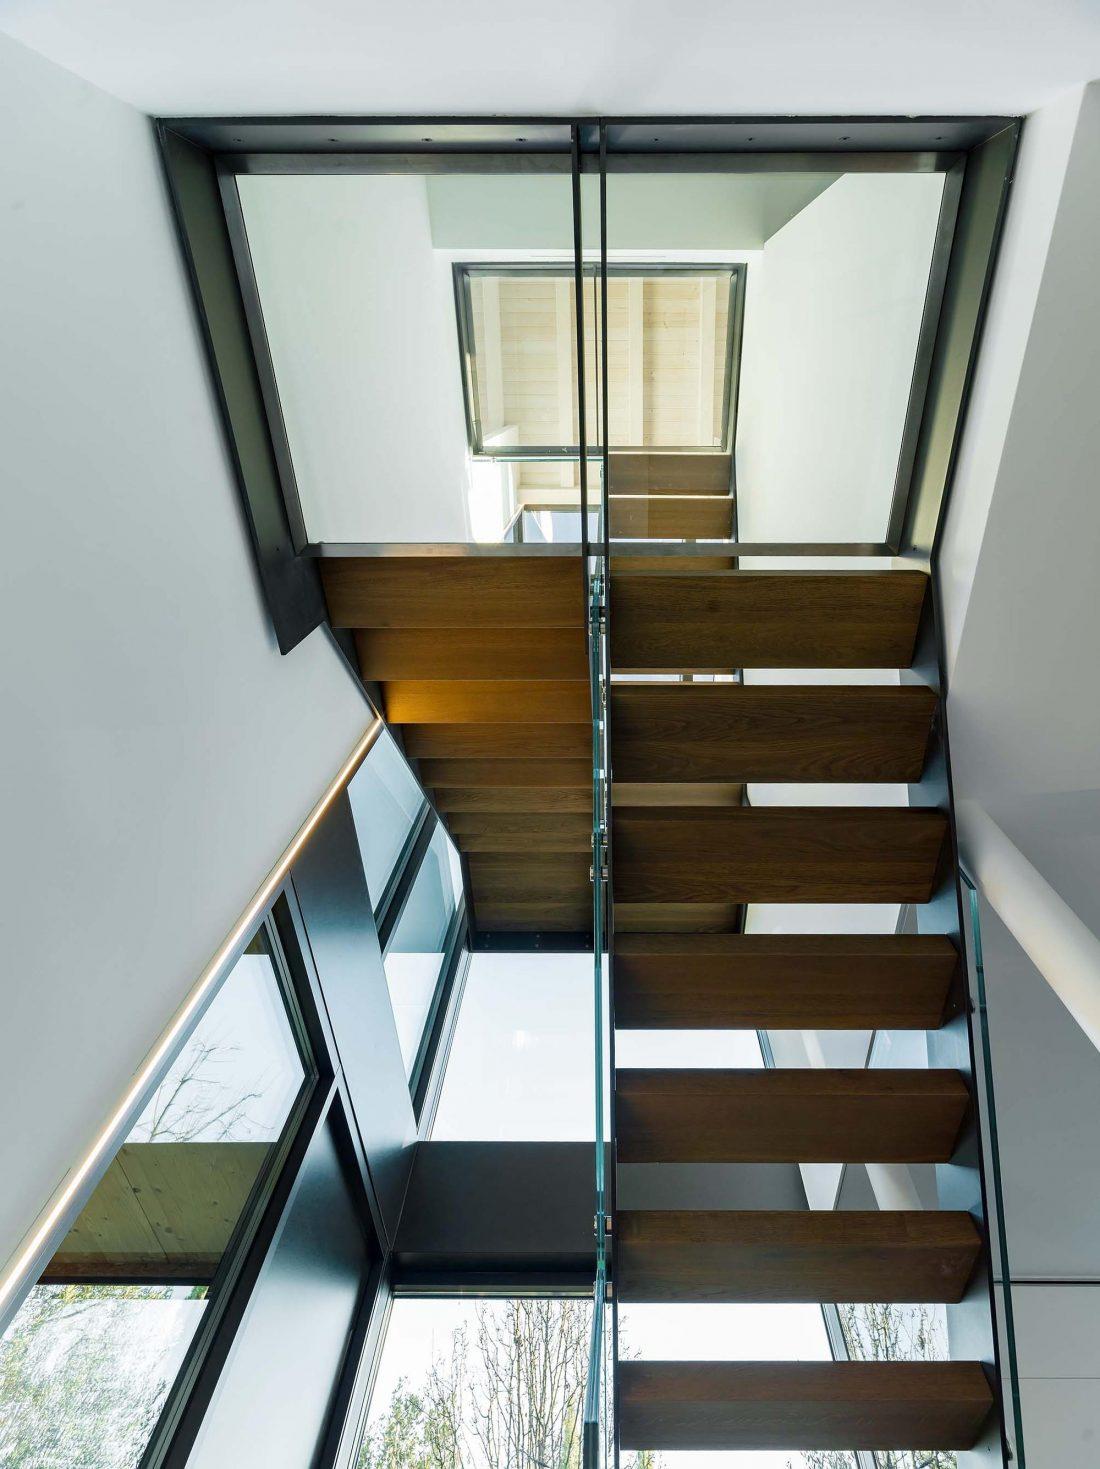 Дом в Порденоне, Италия, от студии Caprioglio Associati Architects 21